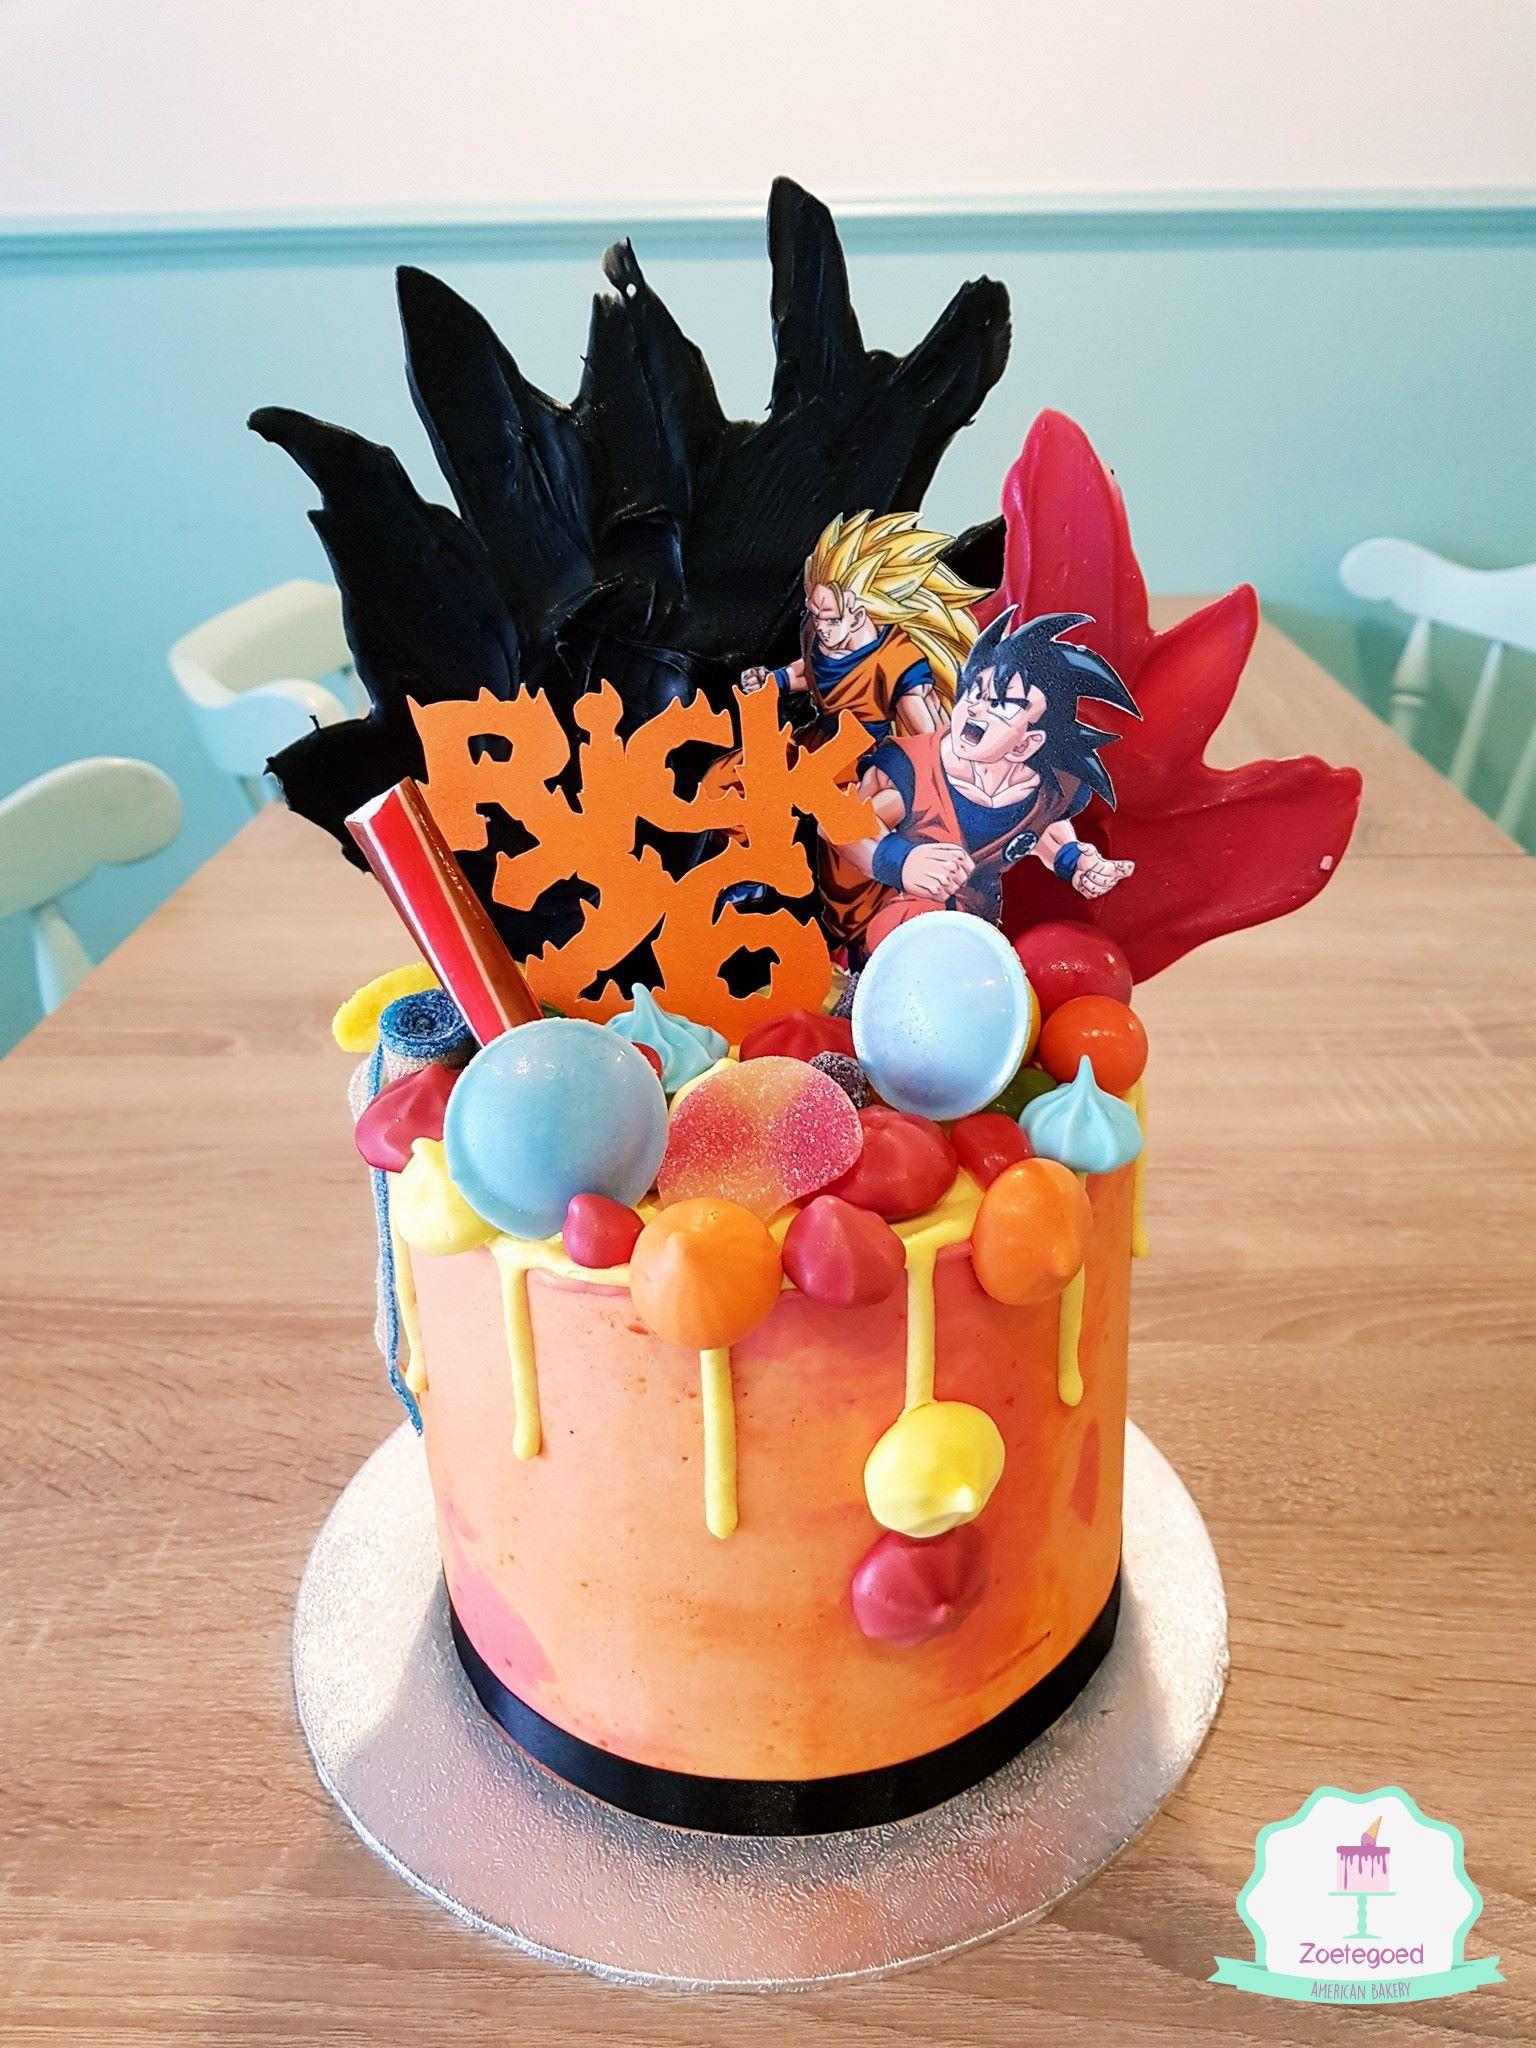 Dragon Ball Z Drip Cake With Images Anime Cake Drip Cakes Cake